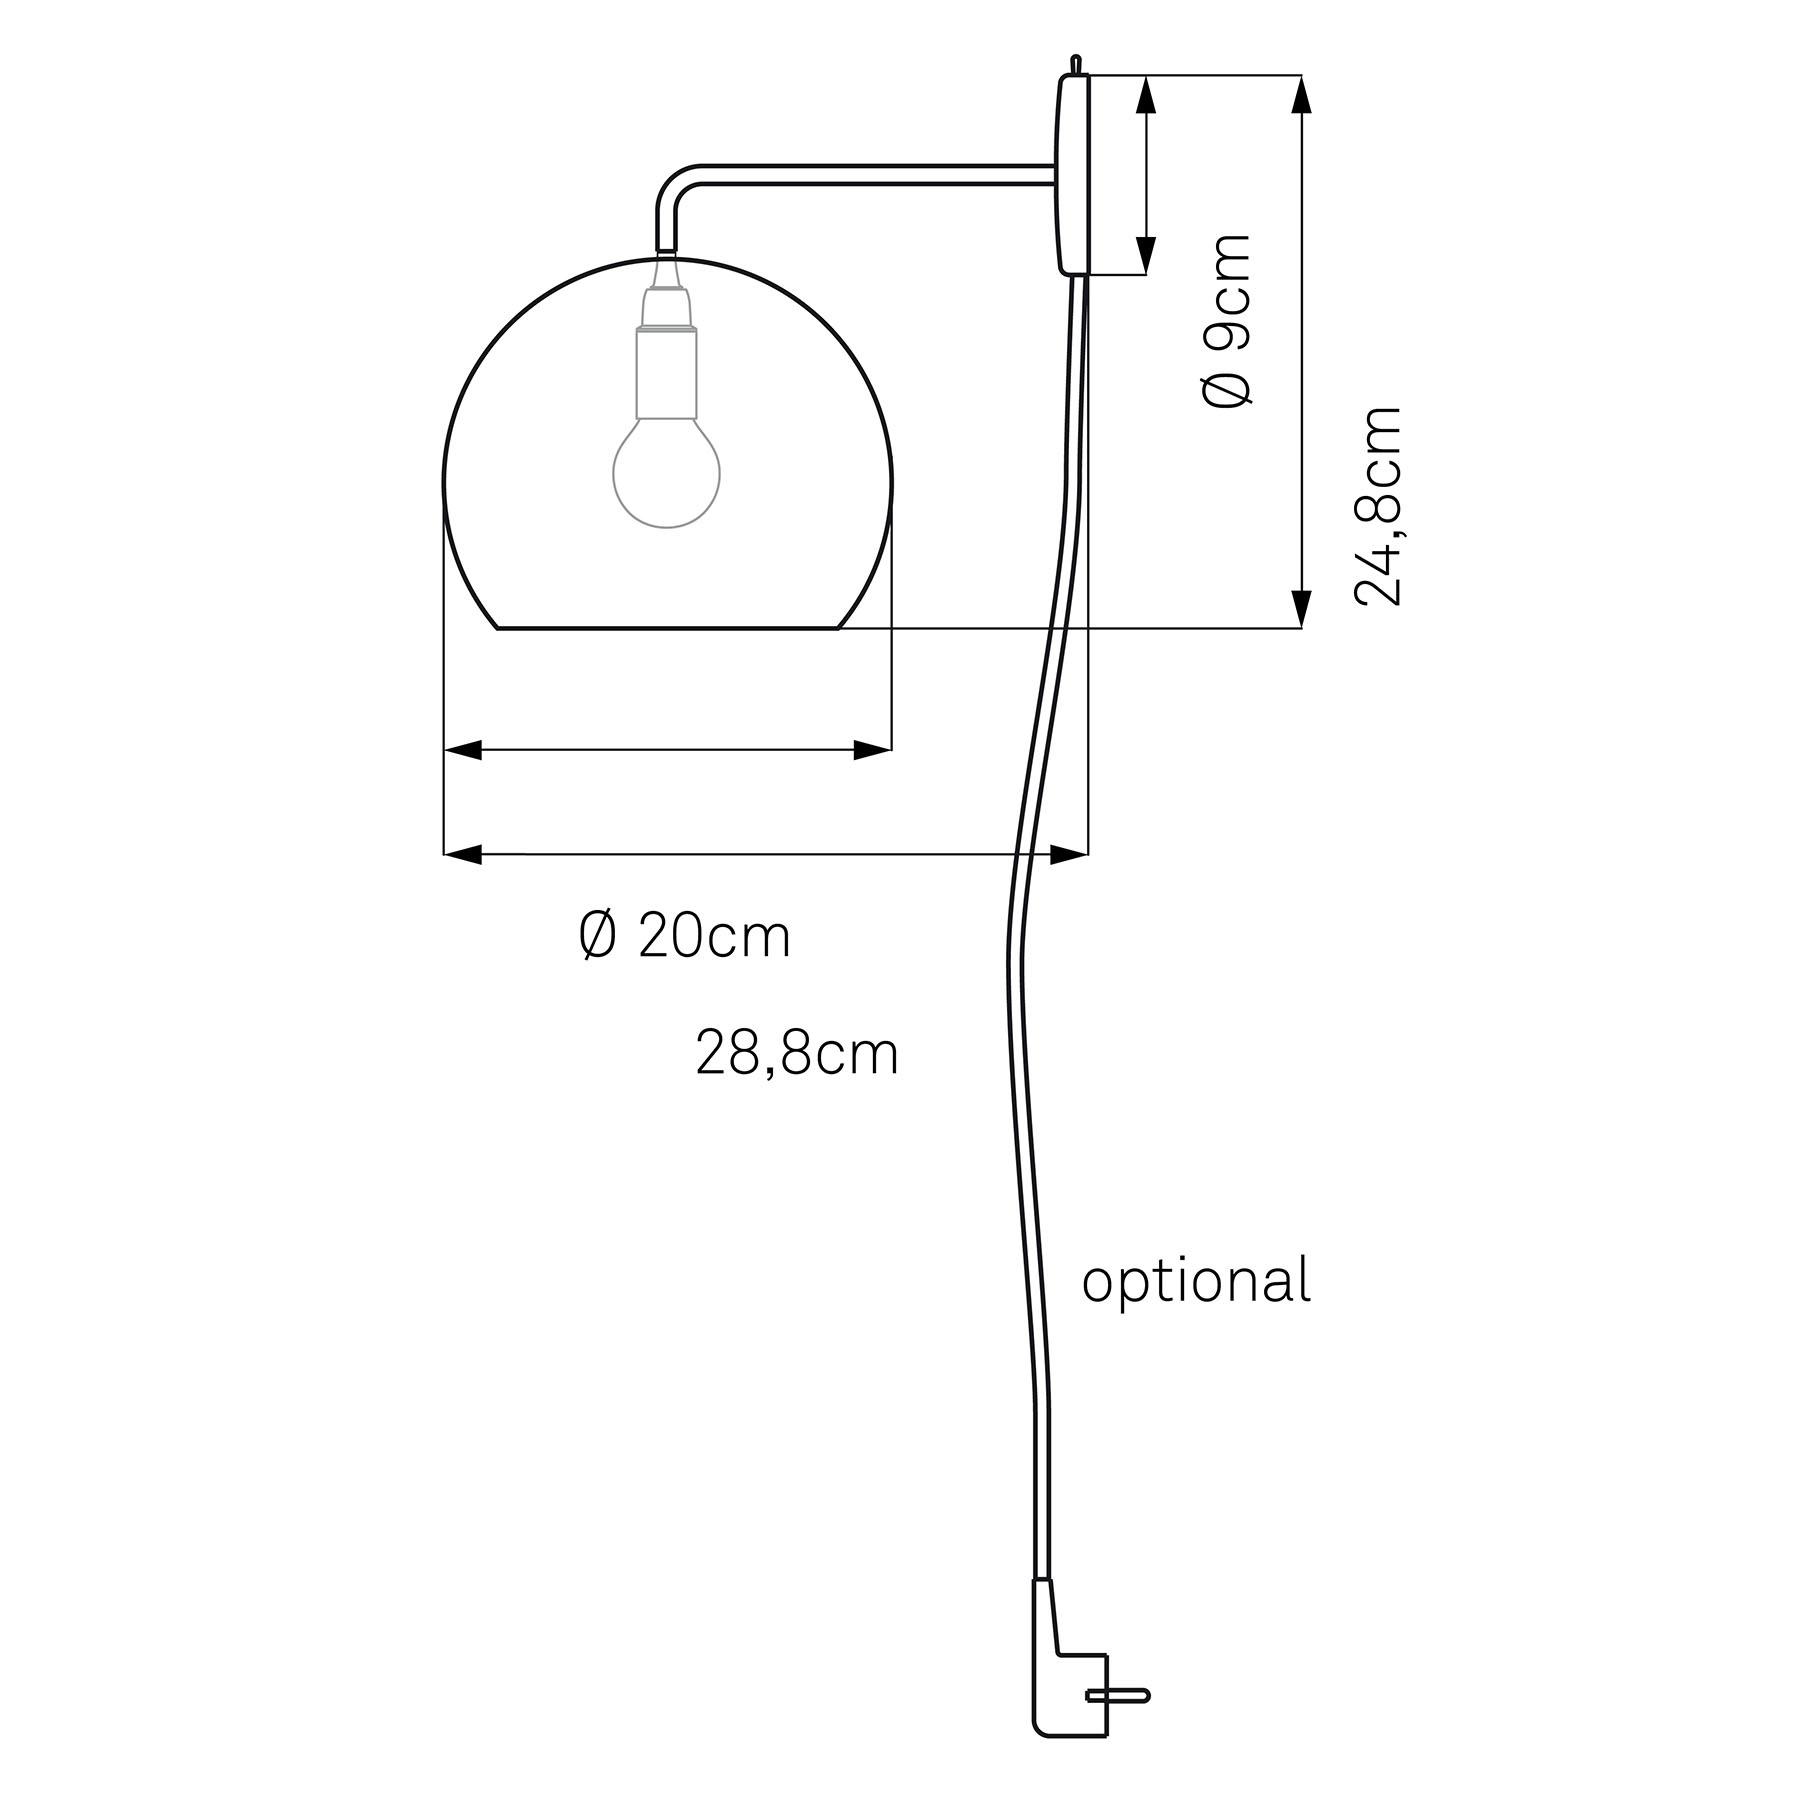 Nyta Tilt Globe Wall wandlamp kabel rood, zwart